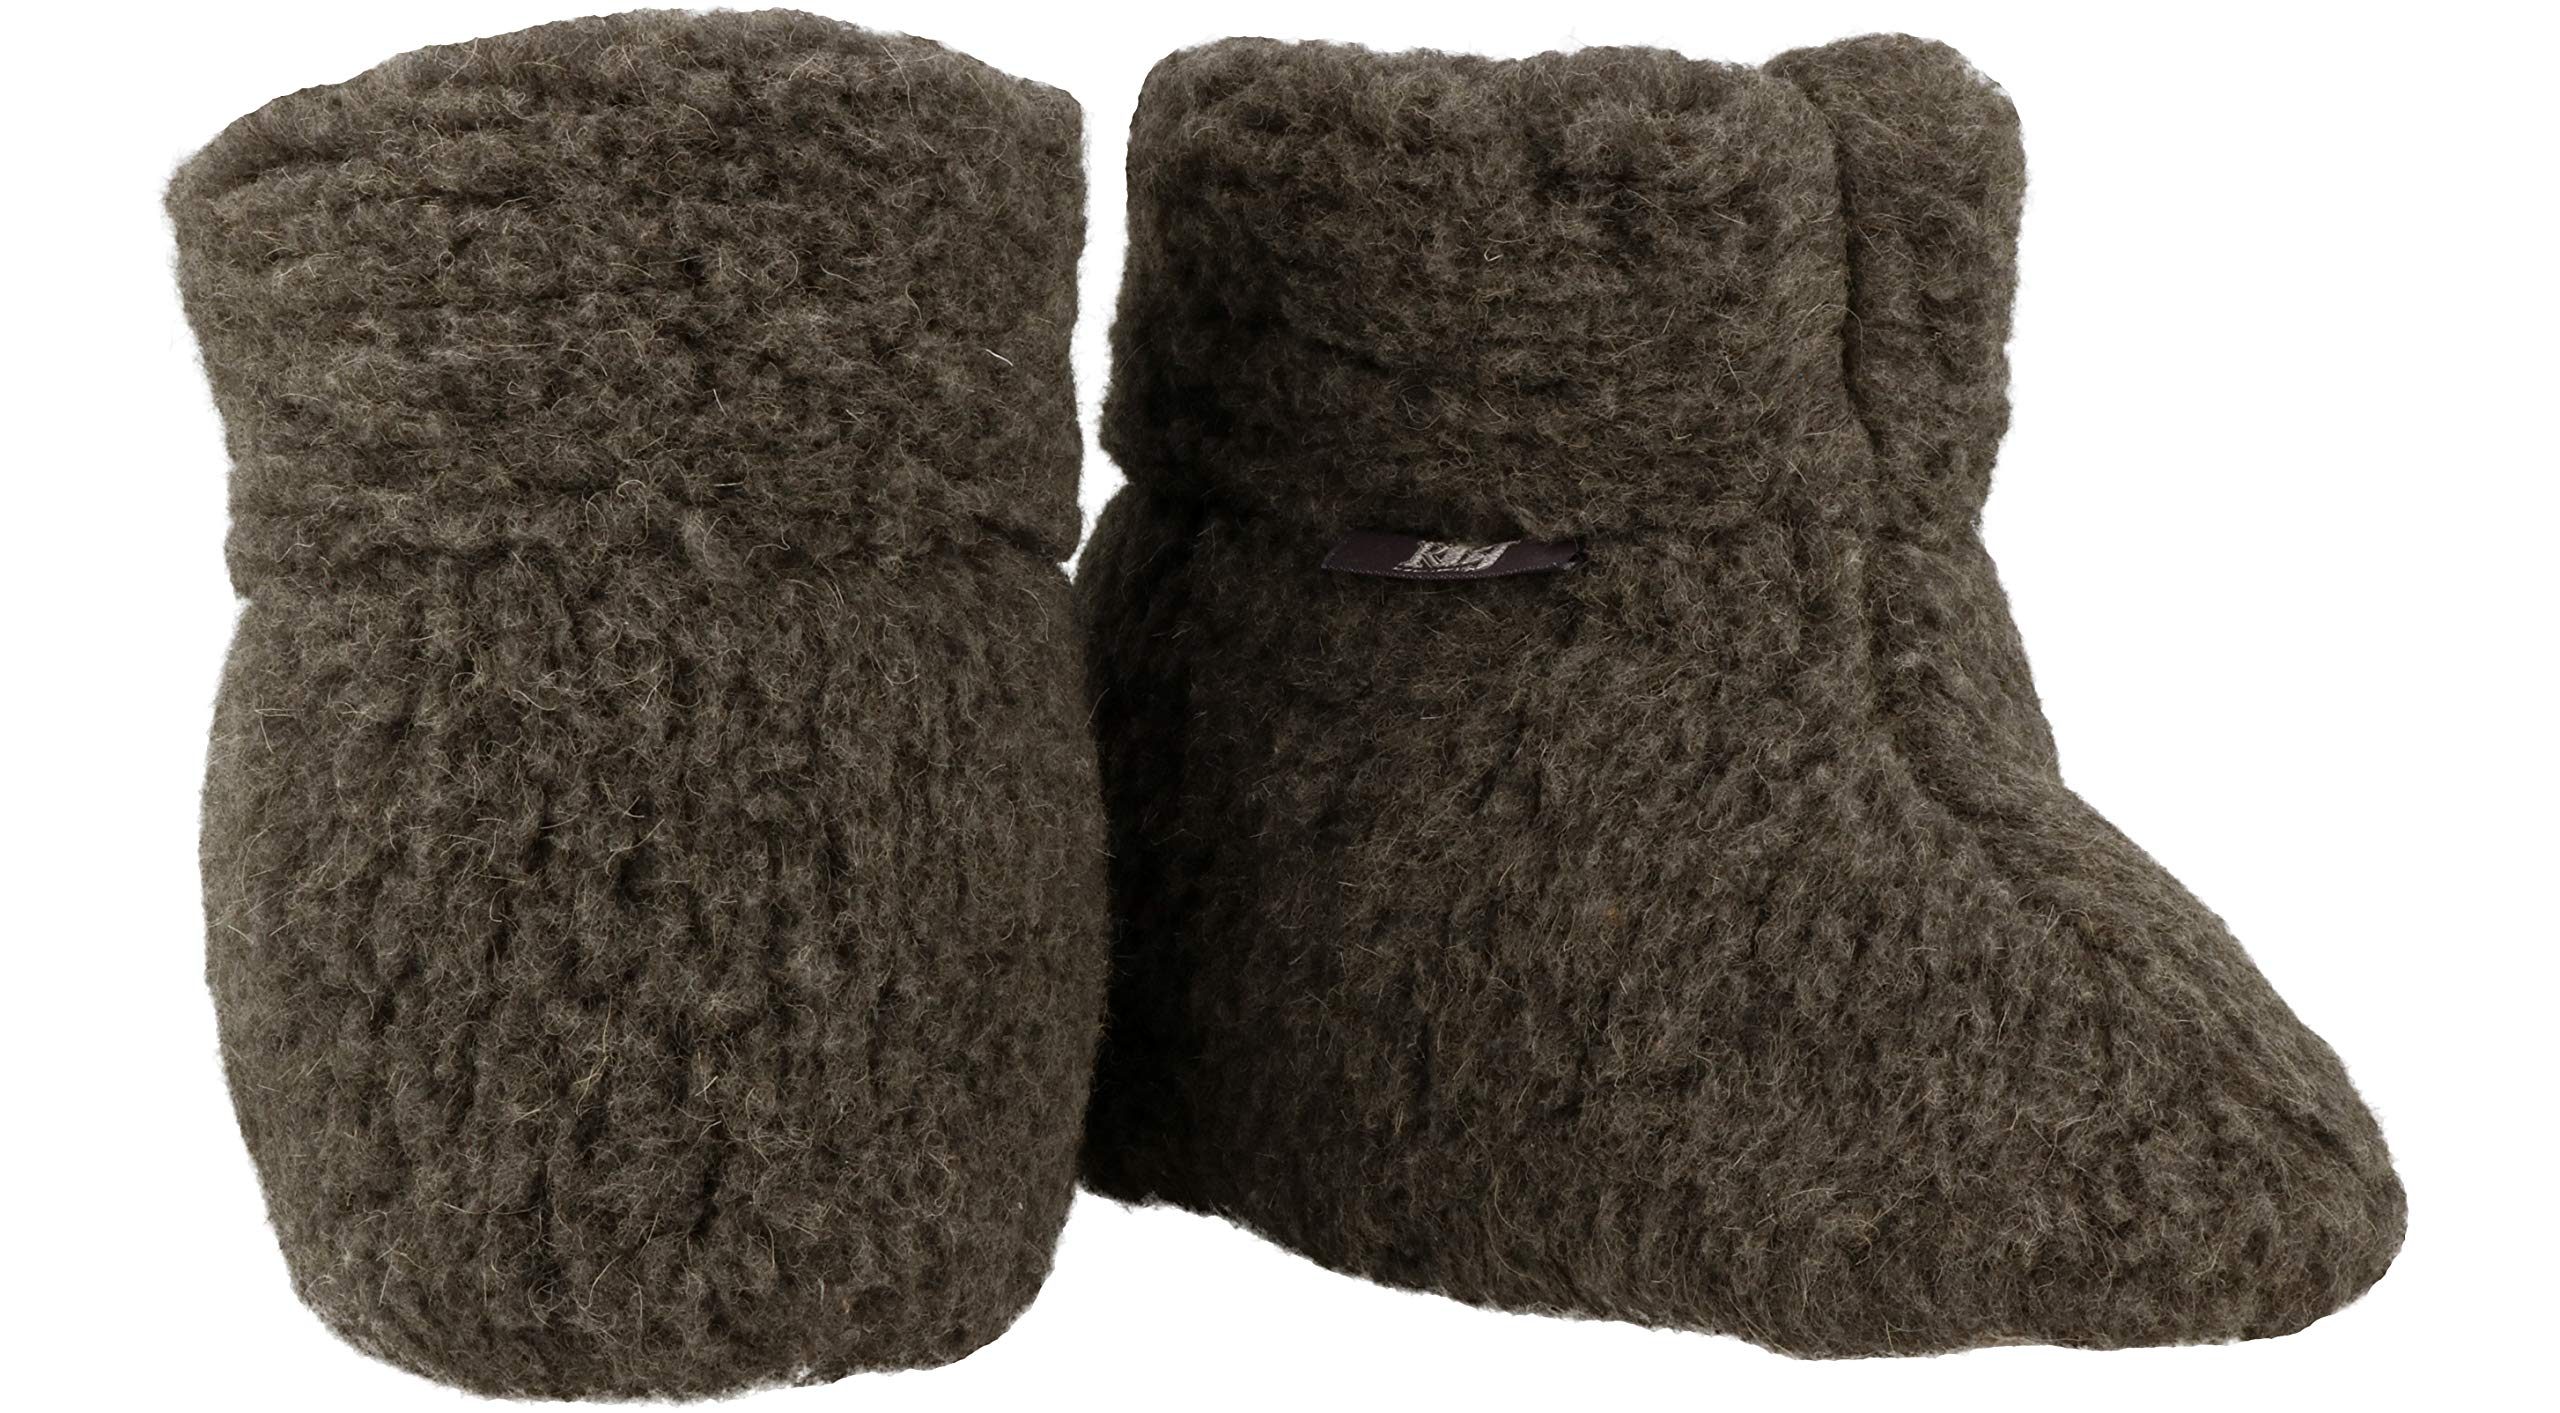 ESTRO Unisex Pure Sheep Warm Wool Slippers Boots Sheepskin ole